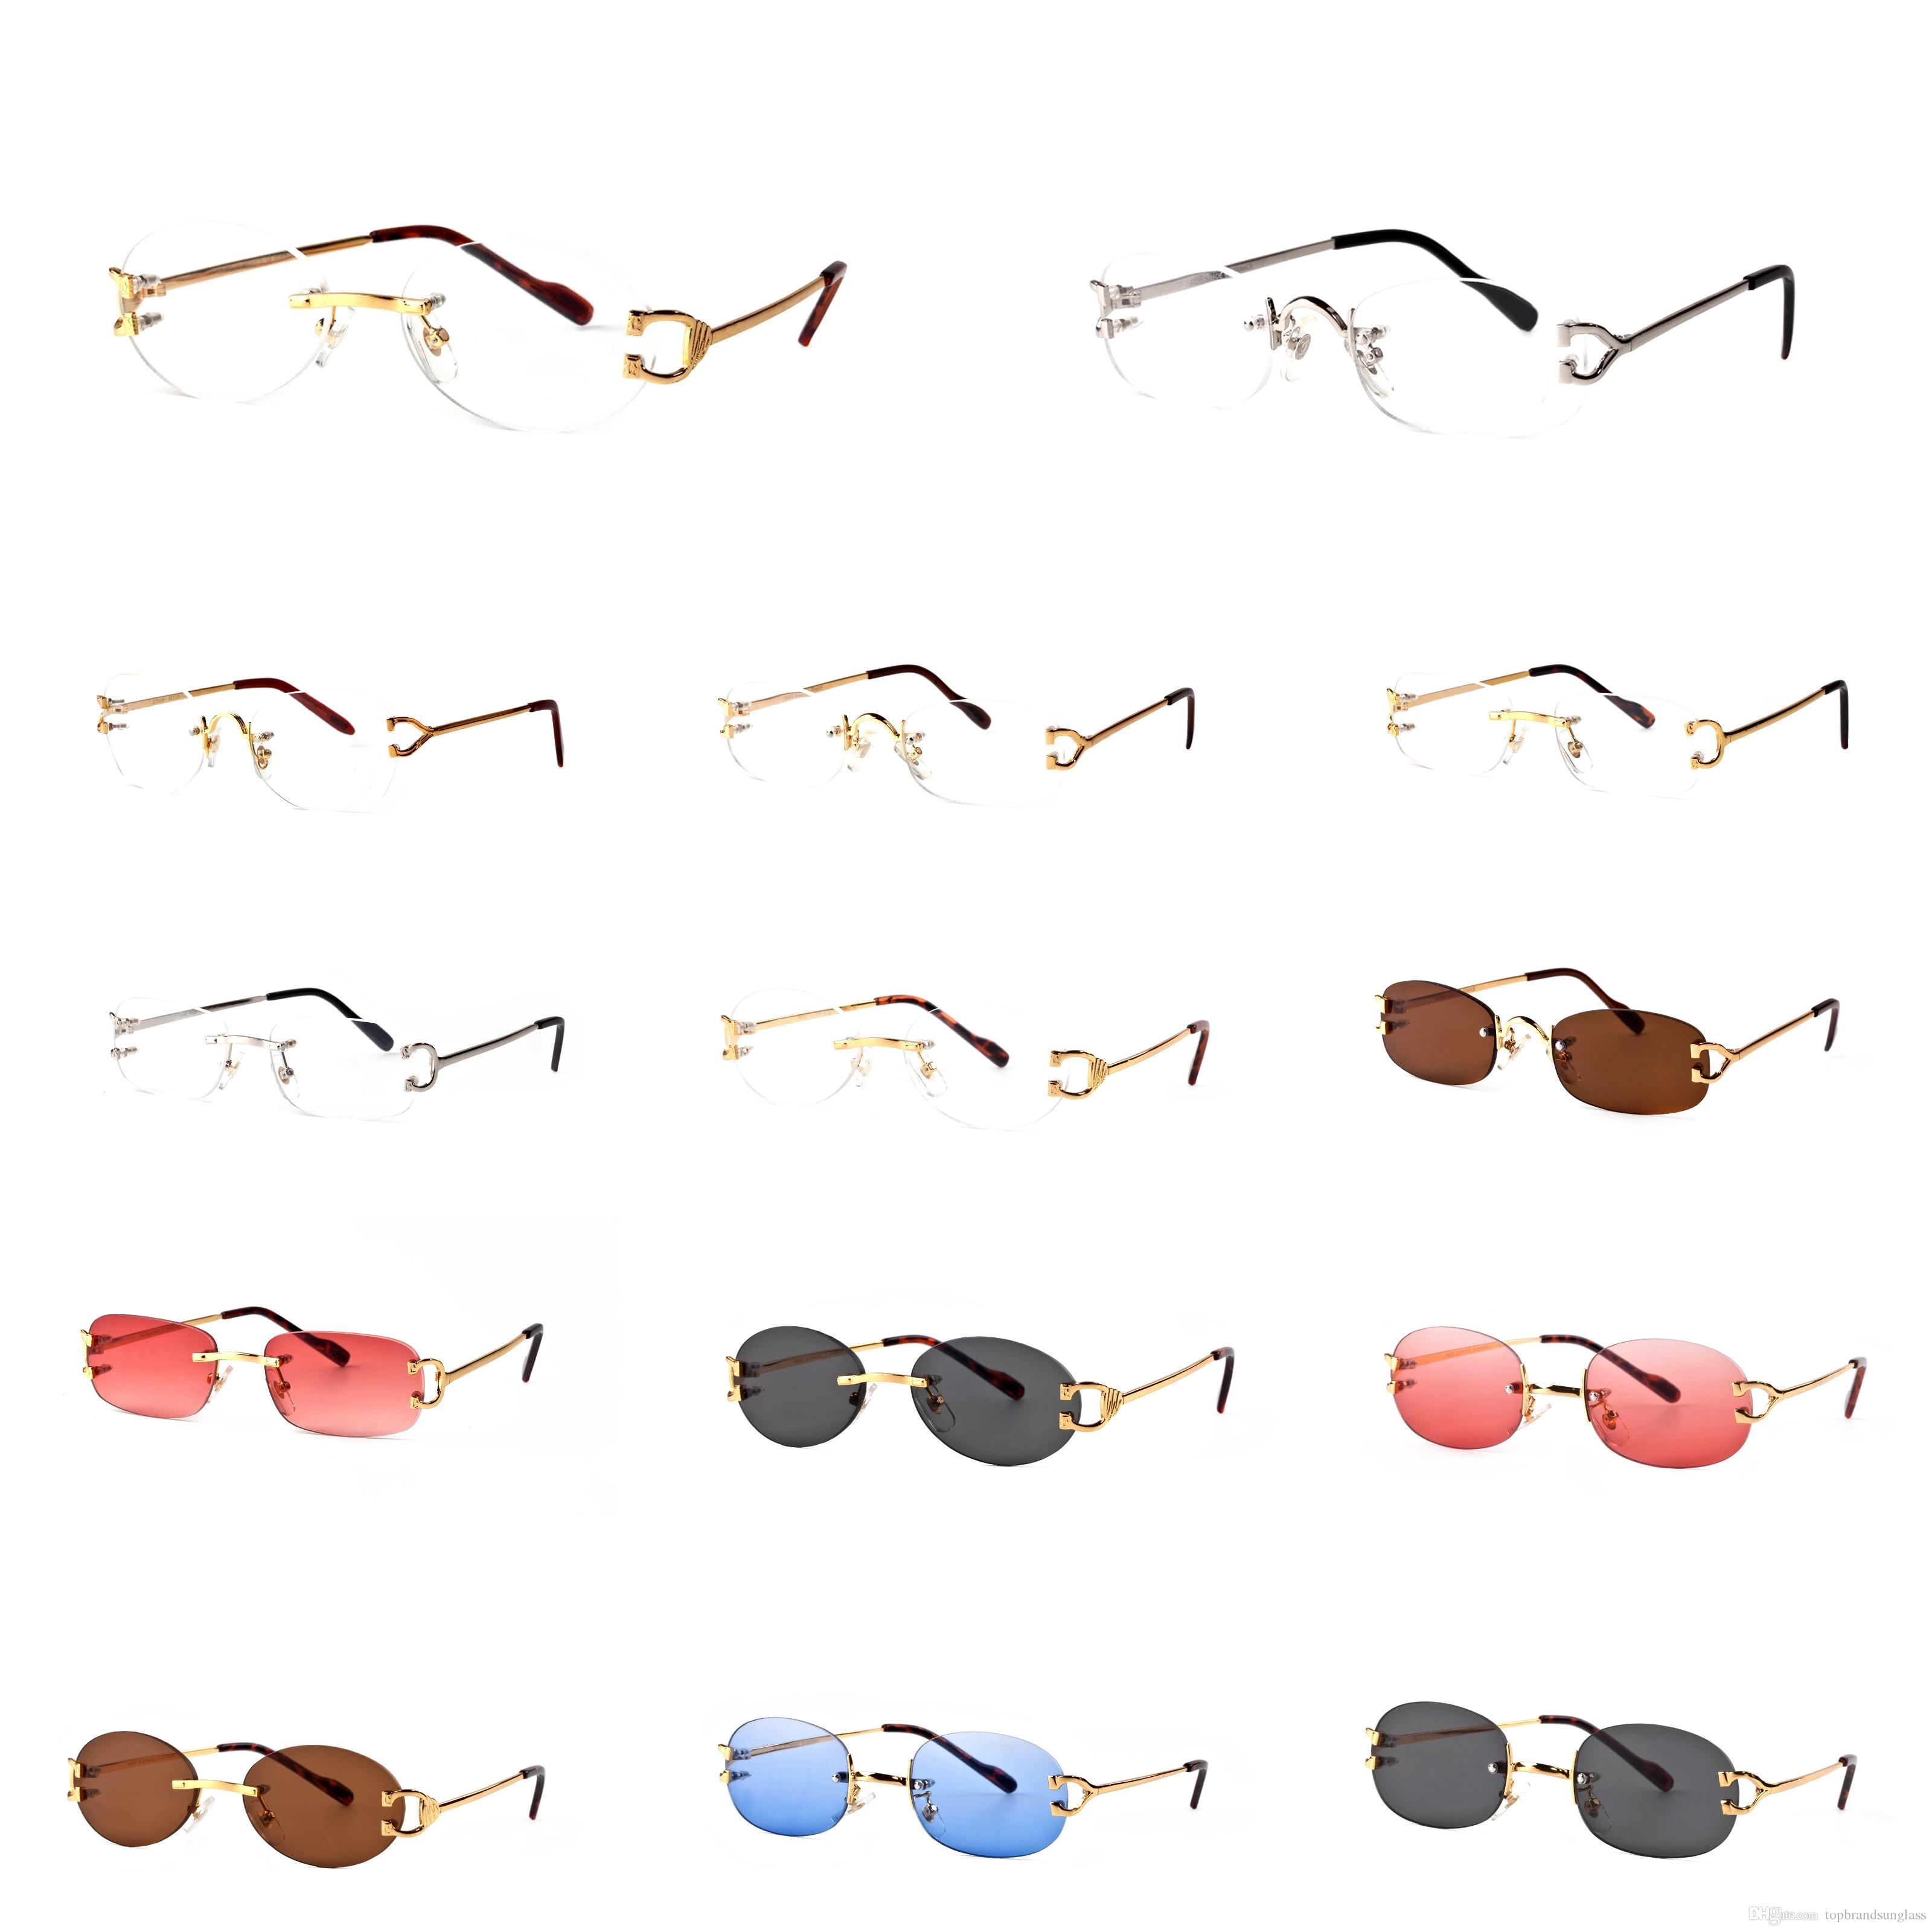 2018 France Brand Buffalo sunglasses men plain Oval mirror glasses c gold metal frame clear lenses optical men sunglasses with original box